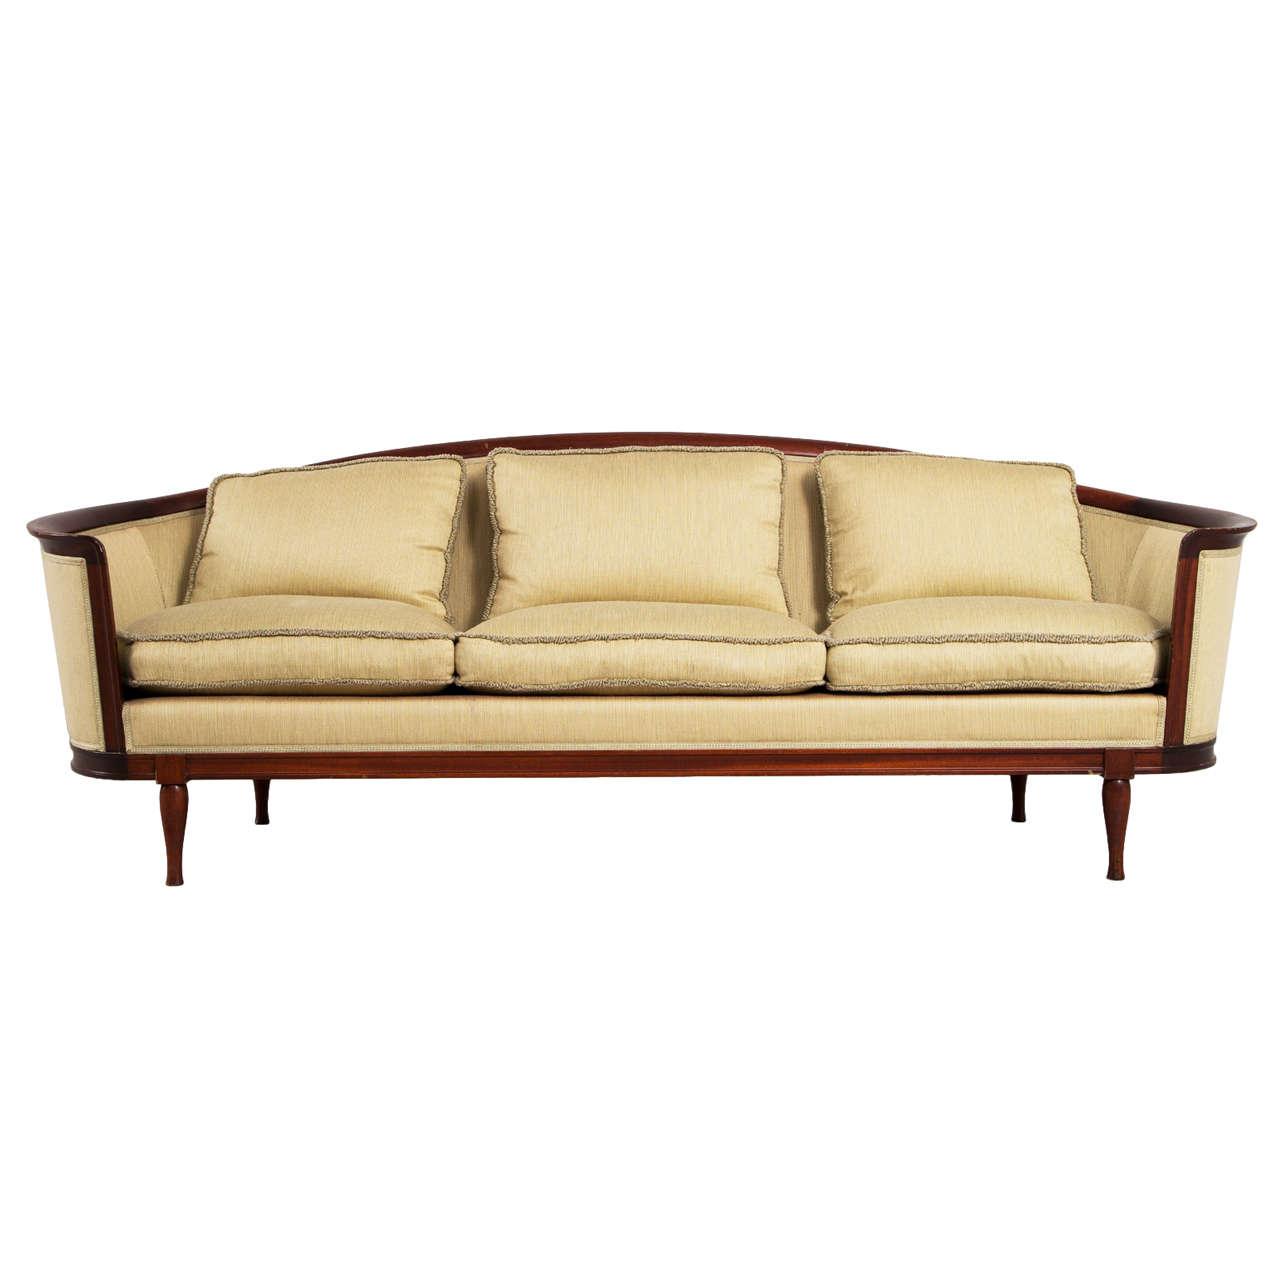 Elegantly curved scandinavian sofa 1930s at 1stdibs for Swedish sofa